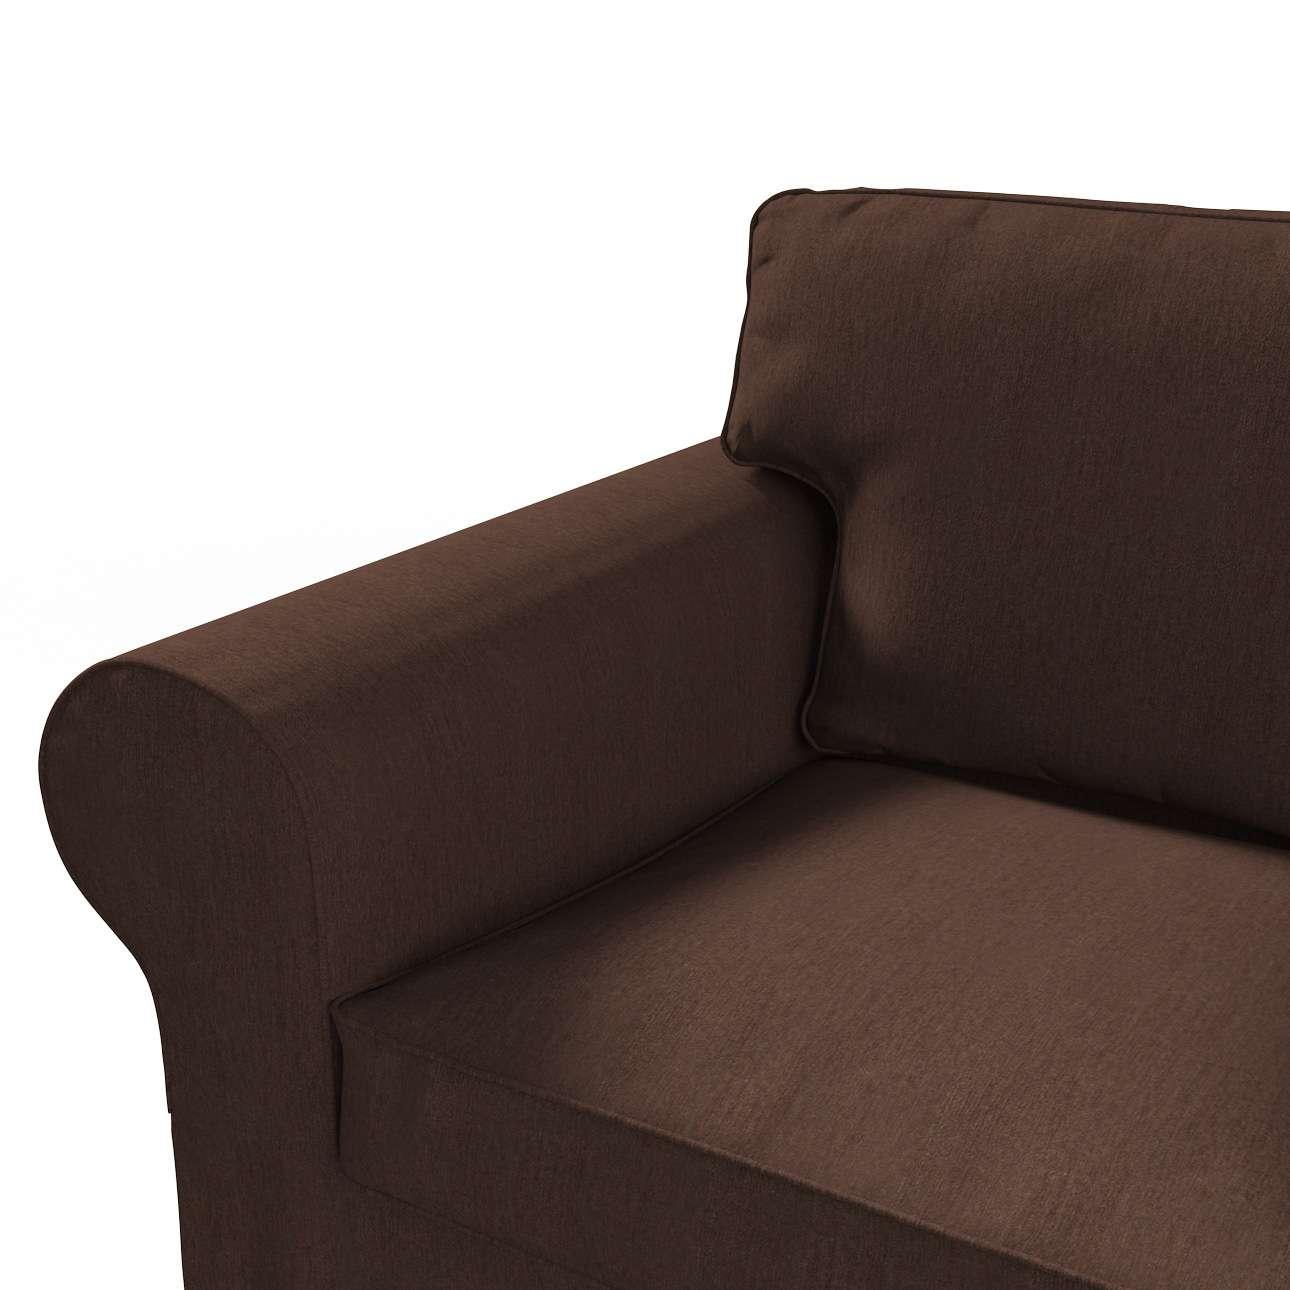 Ektorp betræk 2 sæder sovesofa<br/>fra 2012<br/>Bredde ca 200cm fra kollektionen Chenille, Stof: 702-18